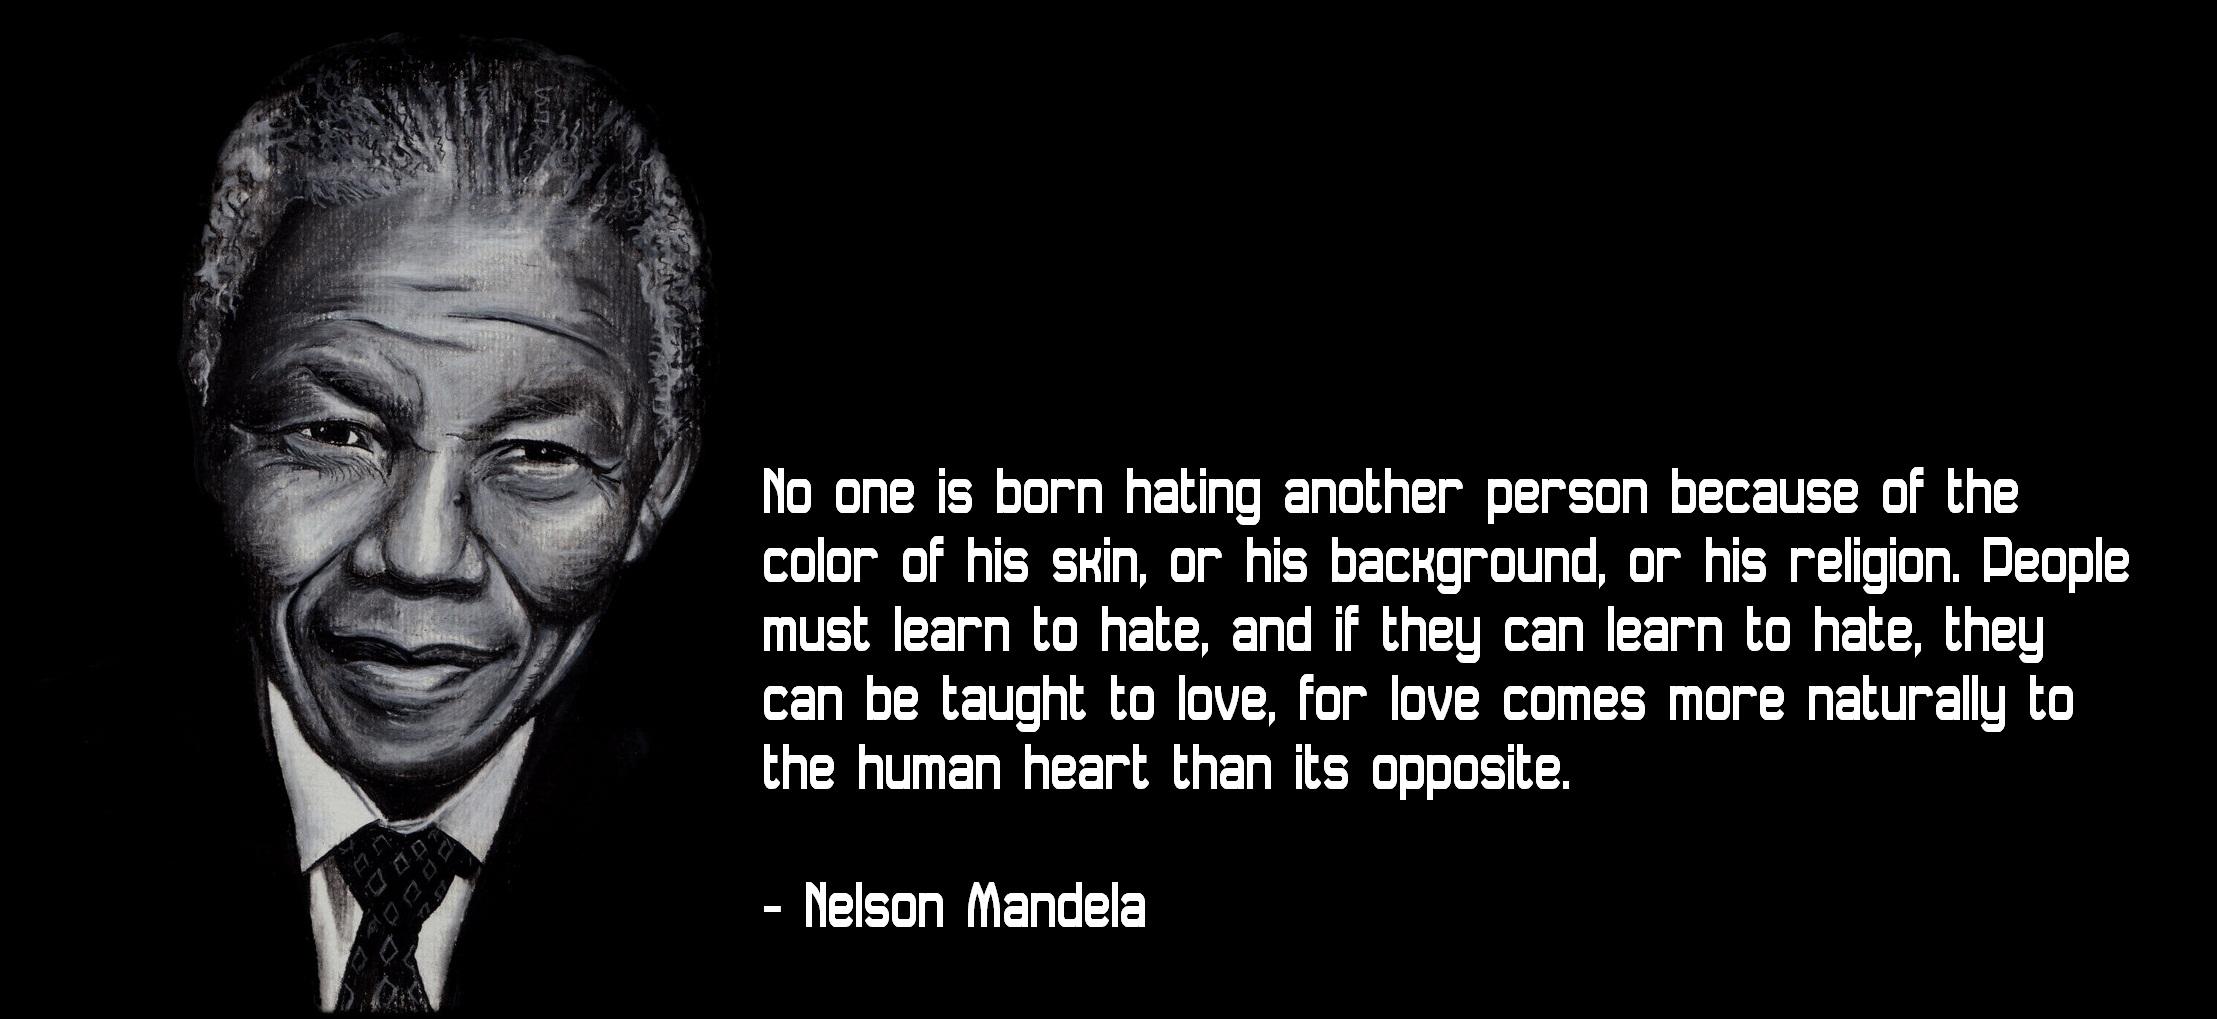 Nelson mandela legacy essay